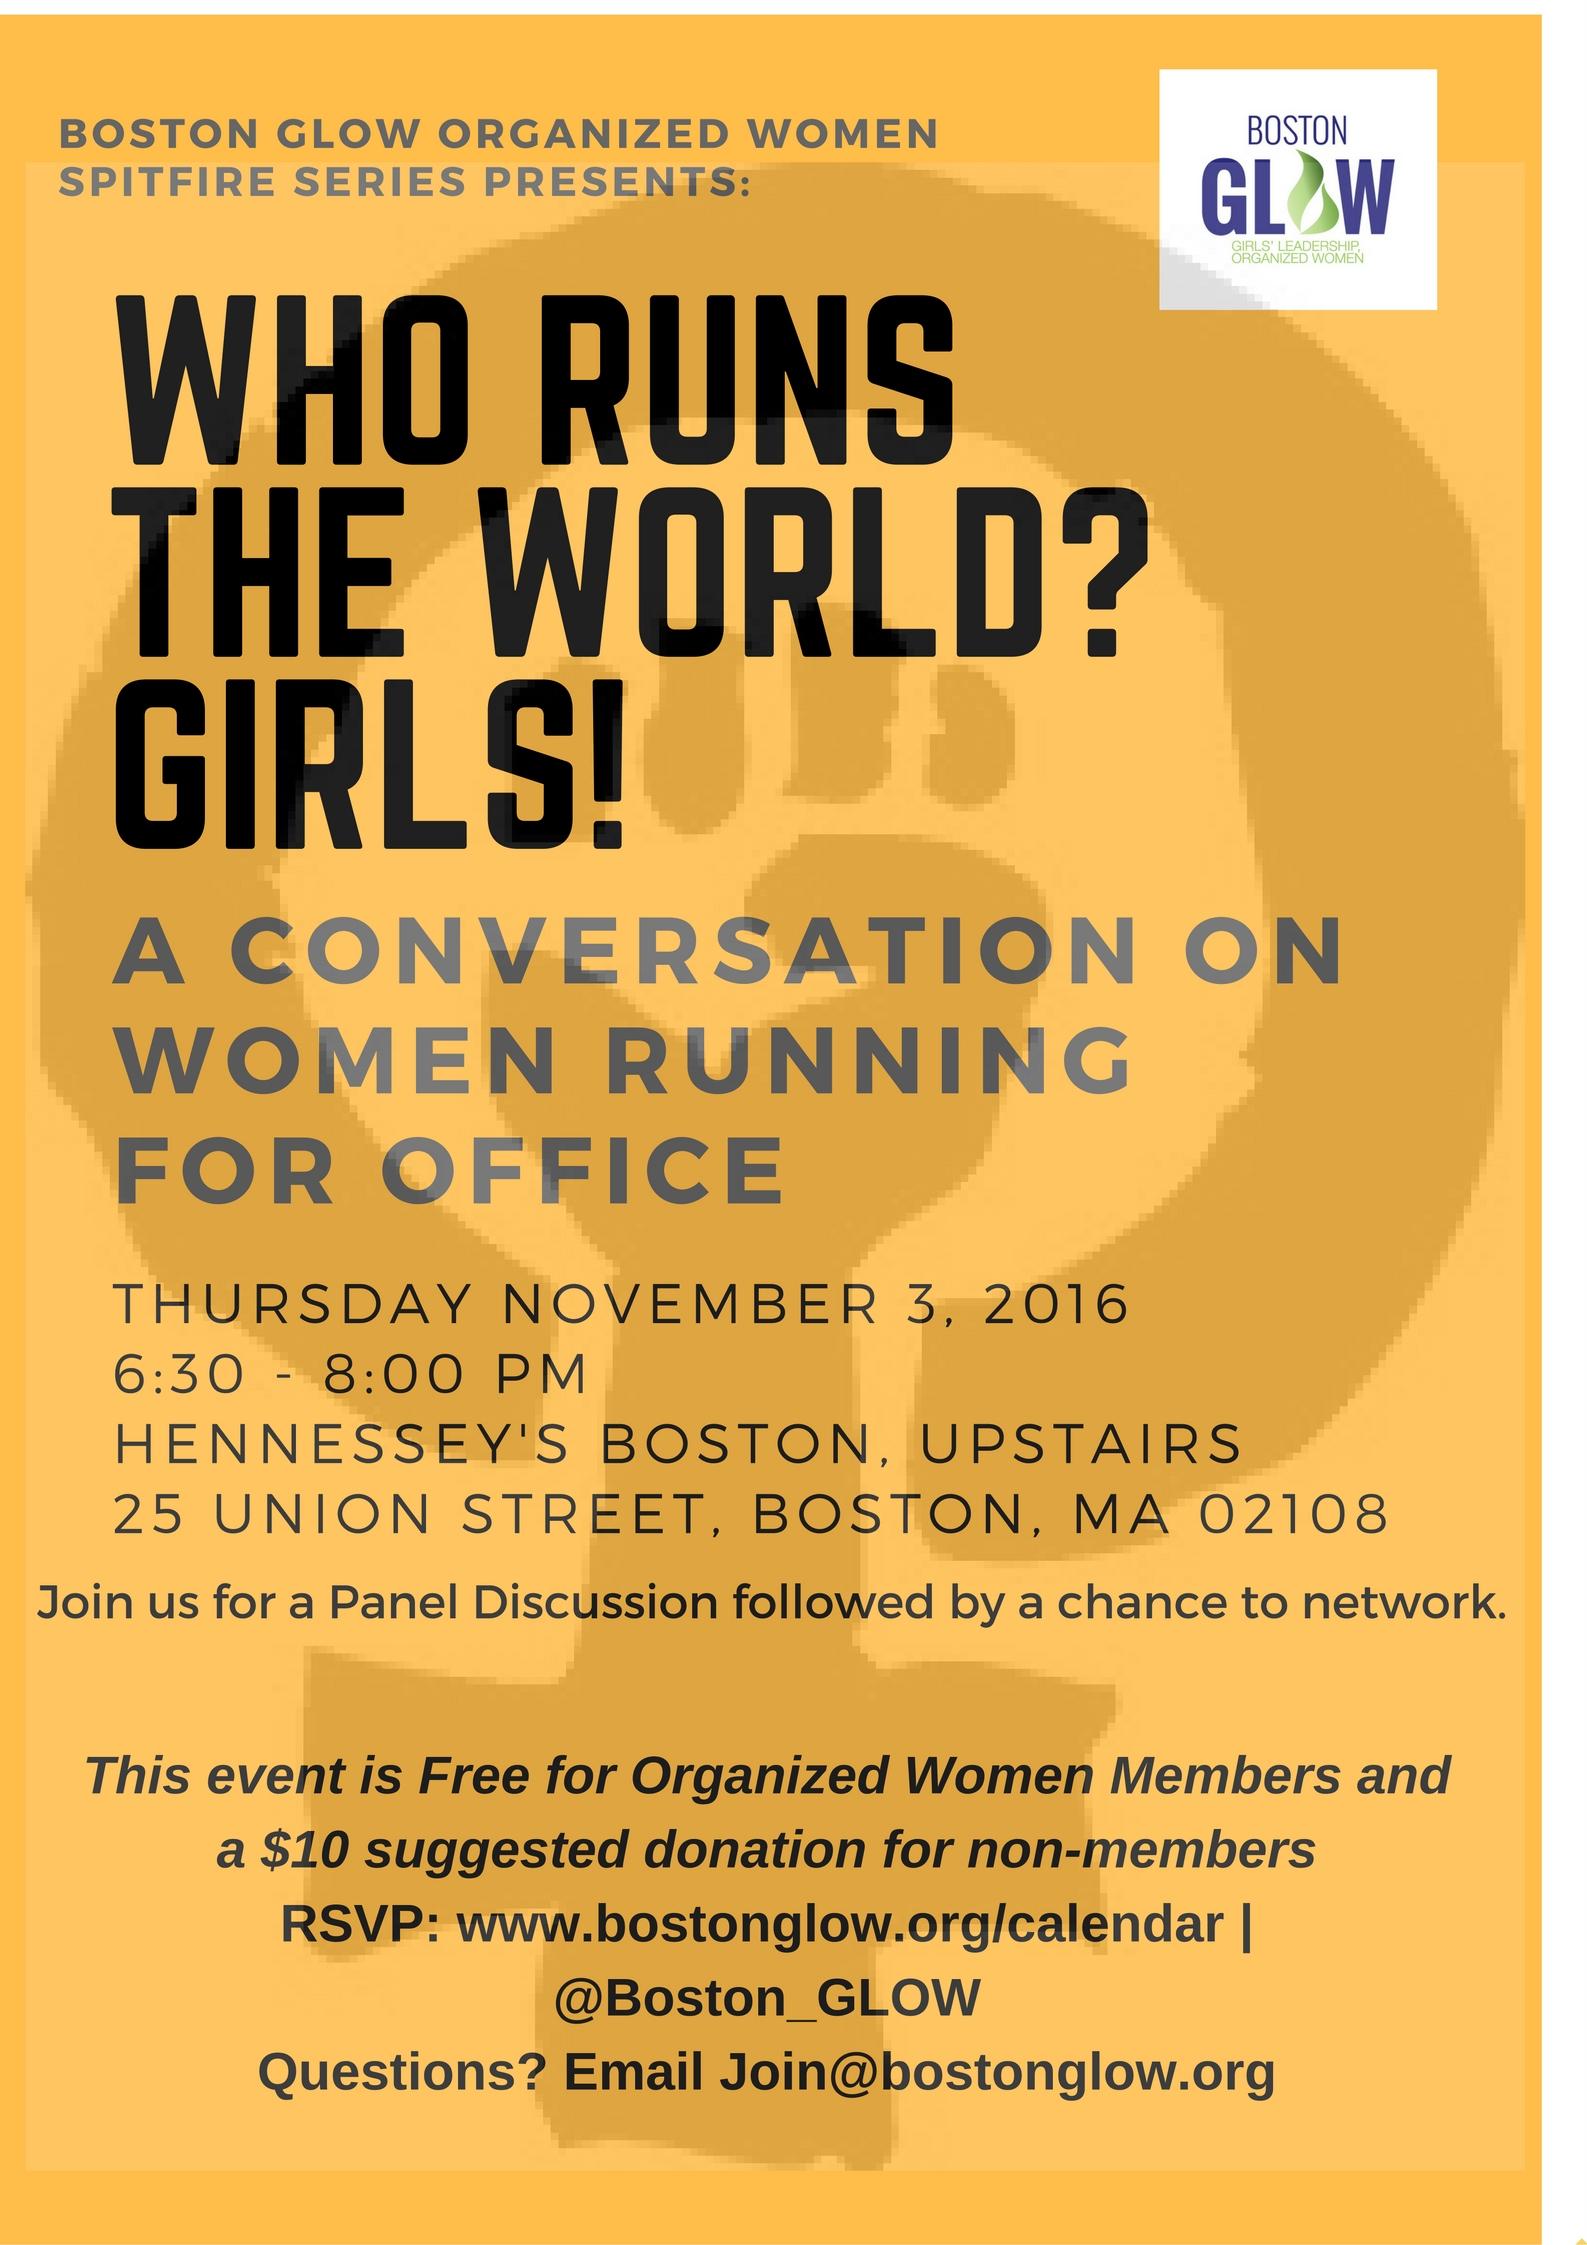 Who_Run_the_World-_Girls!_(4).jpg